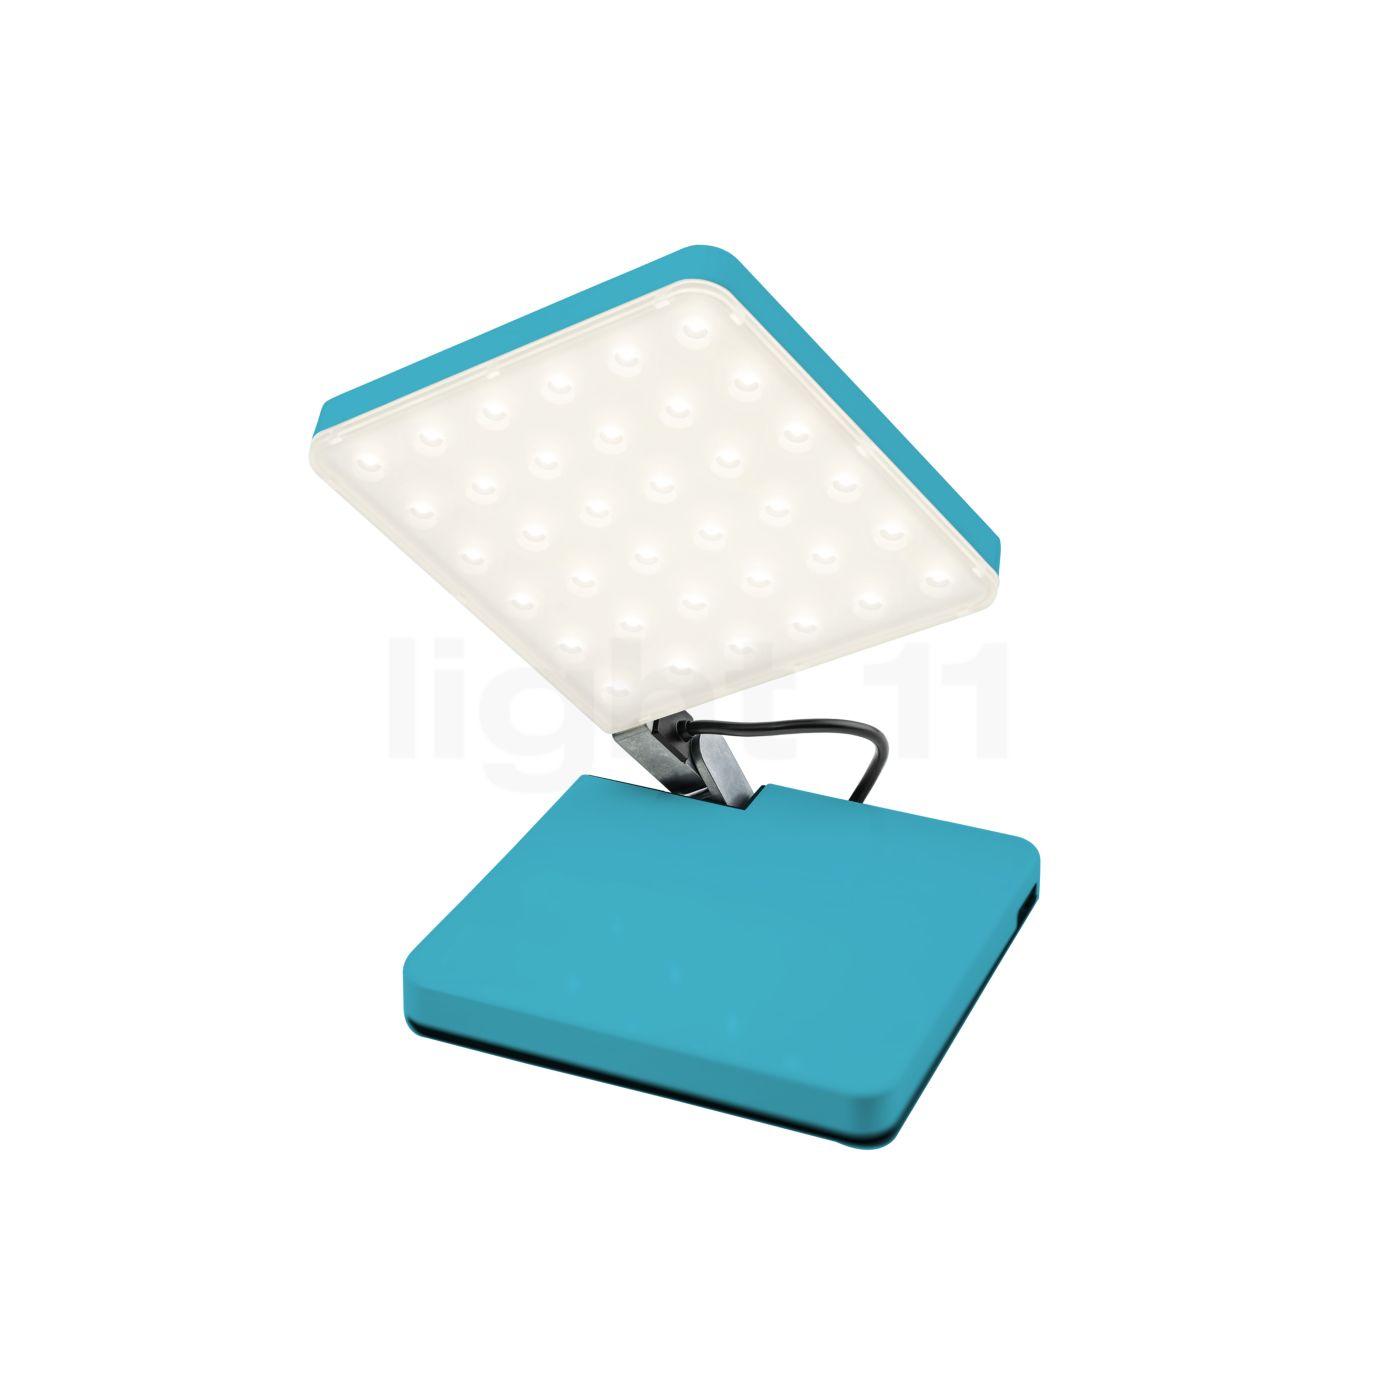 nimbus kabellose mobile leuchte roxxane fly. Black Bedroom Furniture Sets. Home Design Ideas